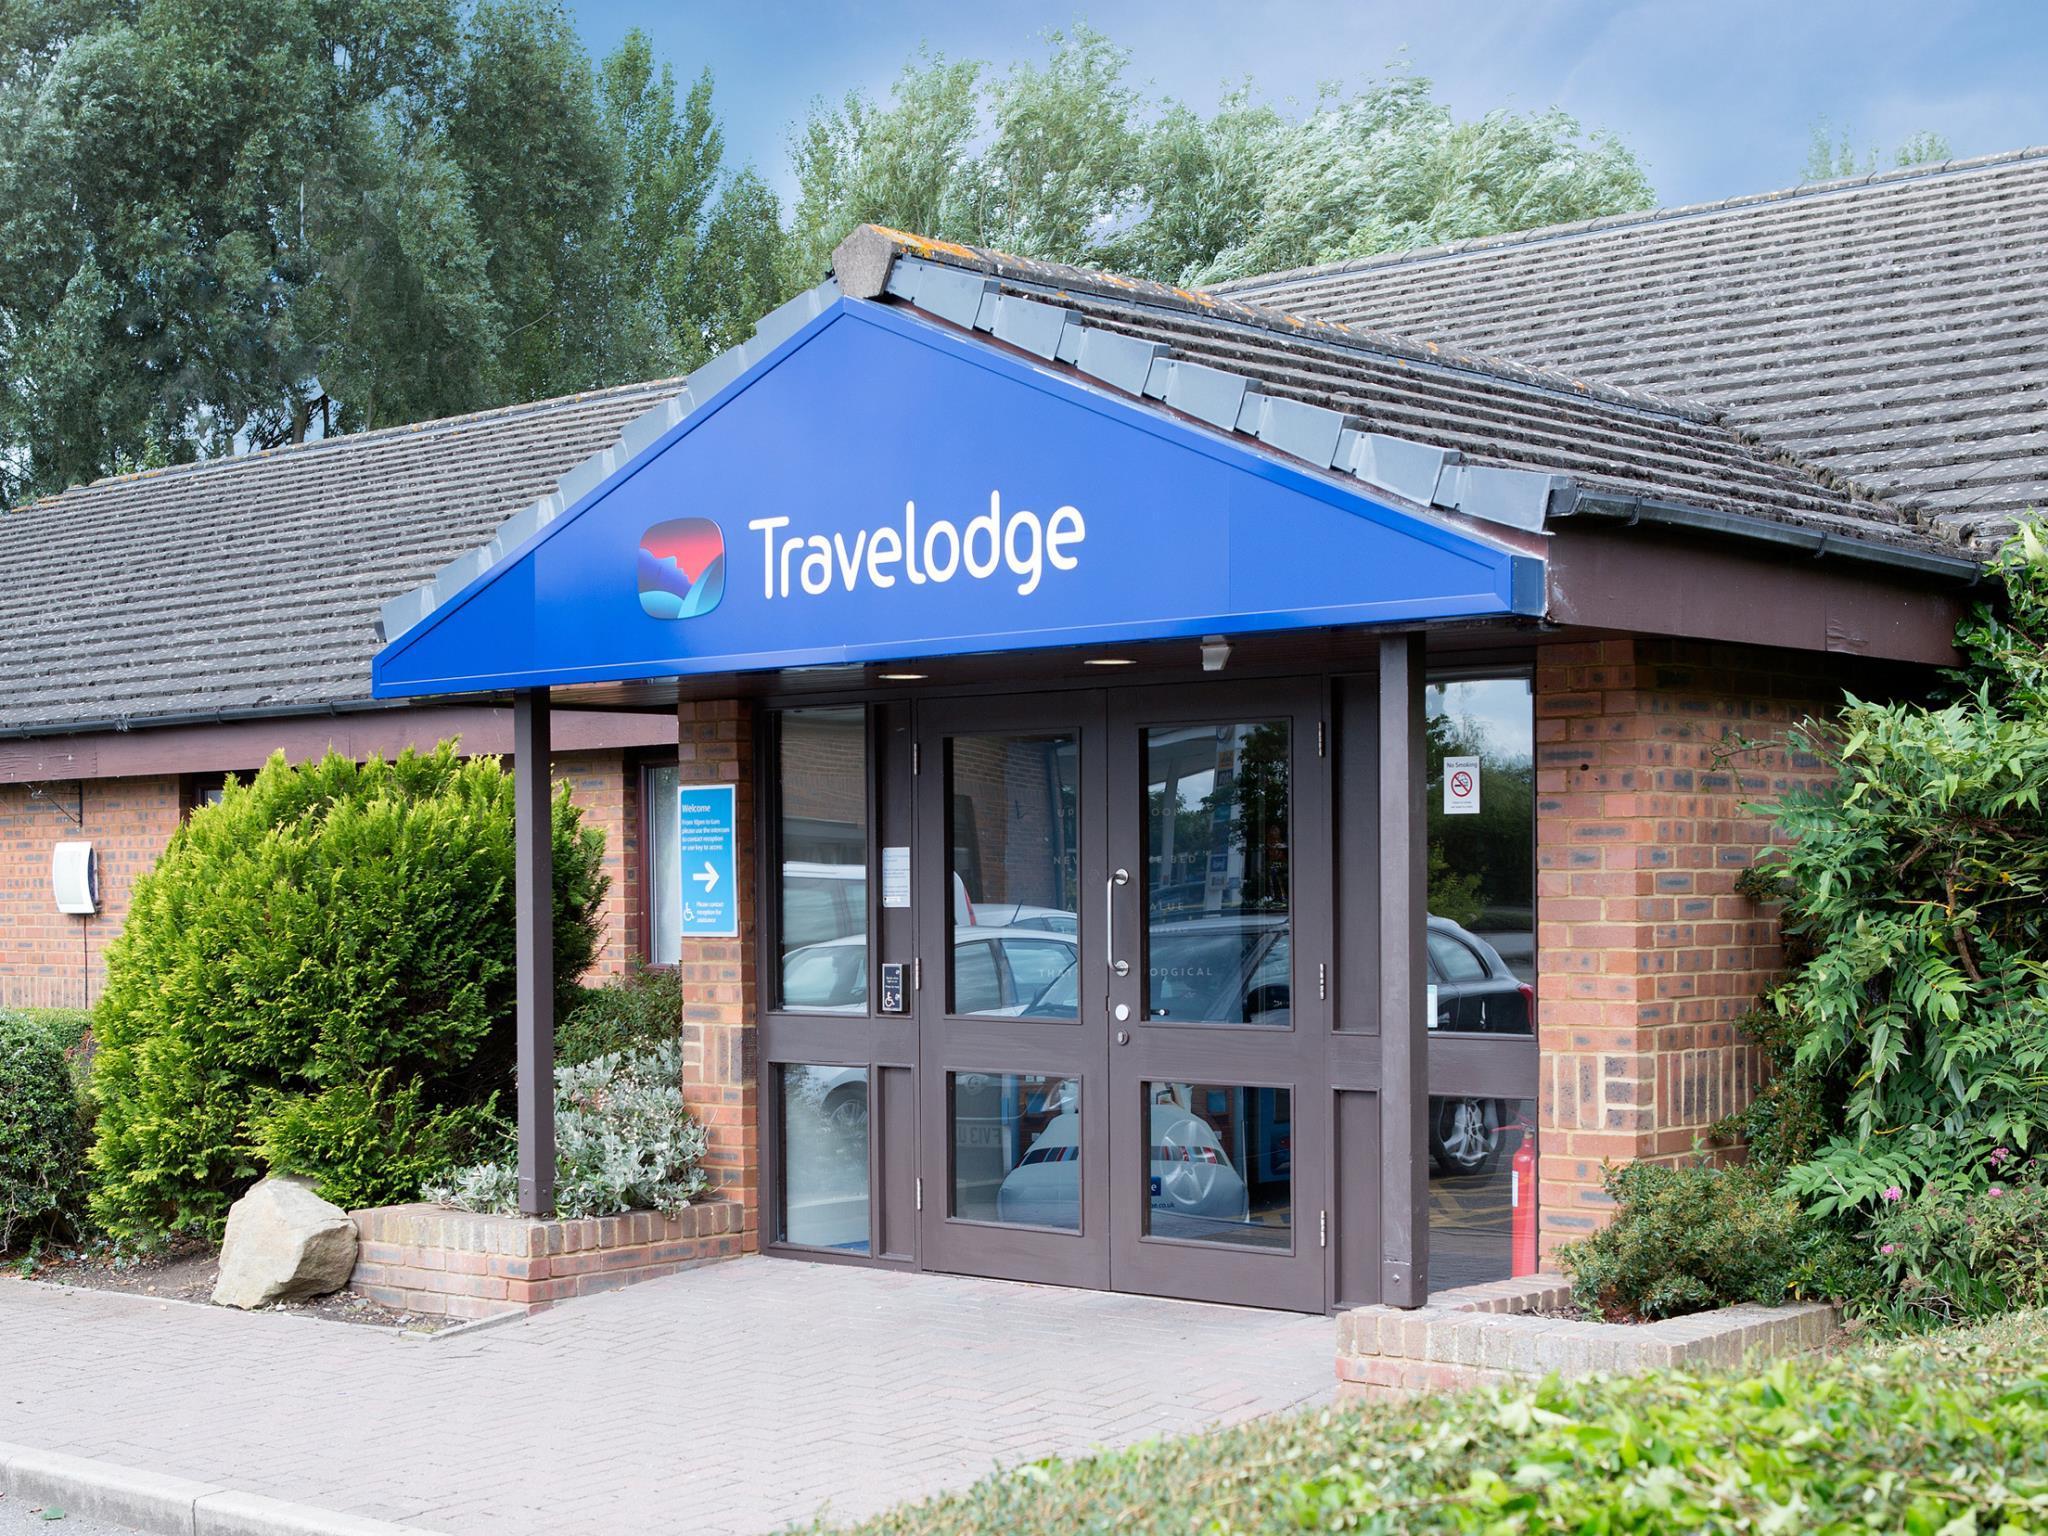 Travelodge Thame